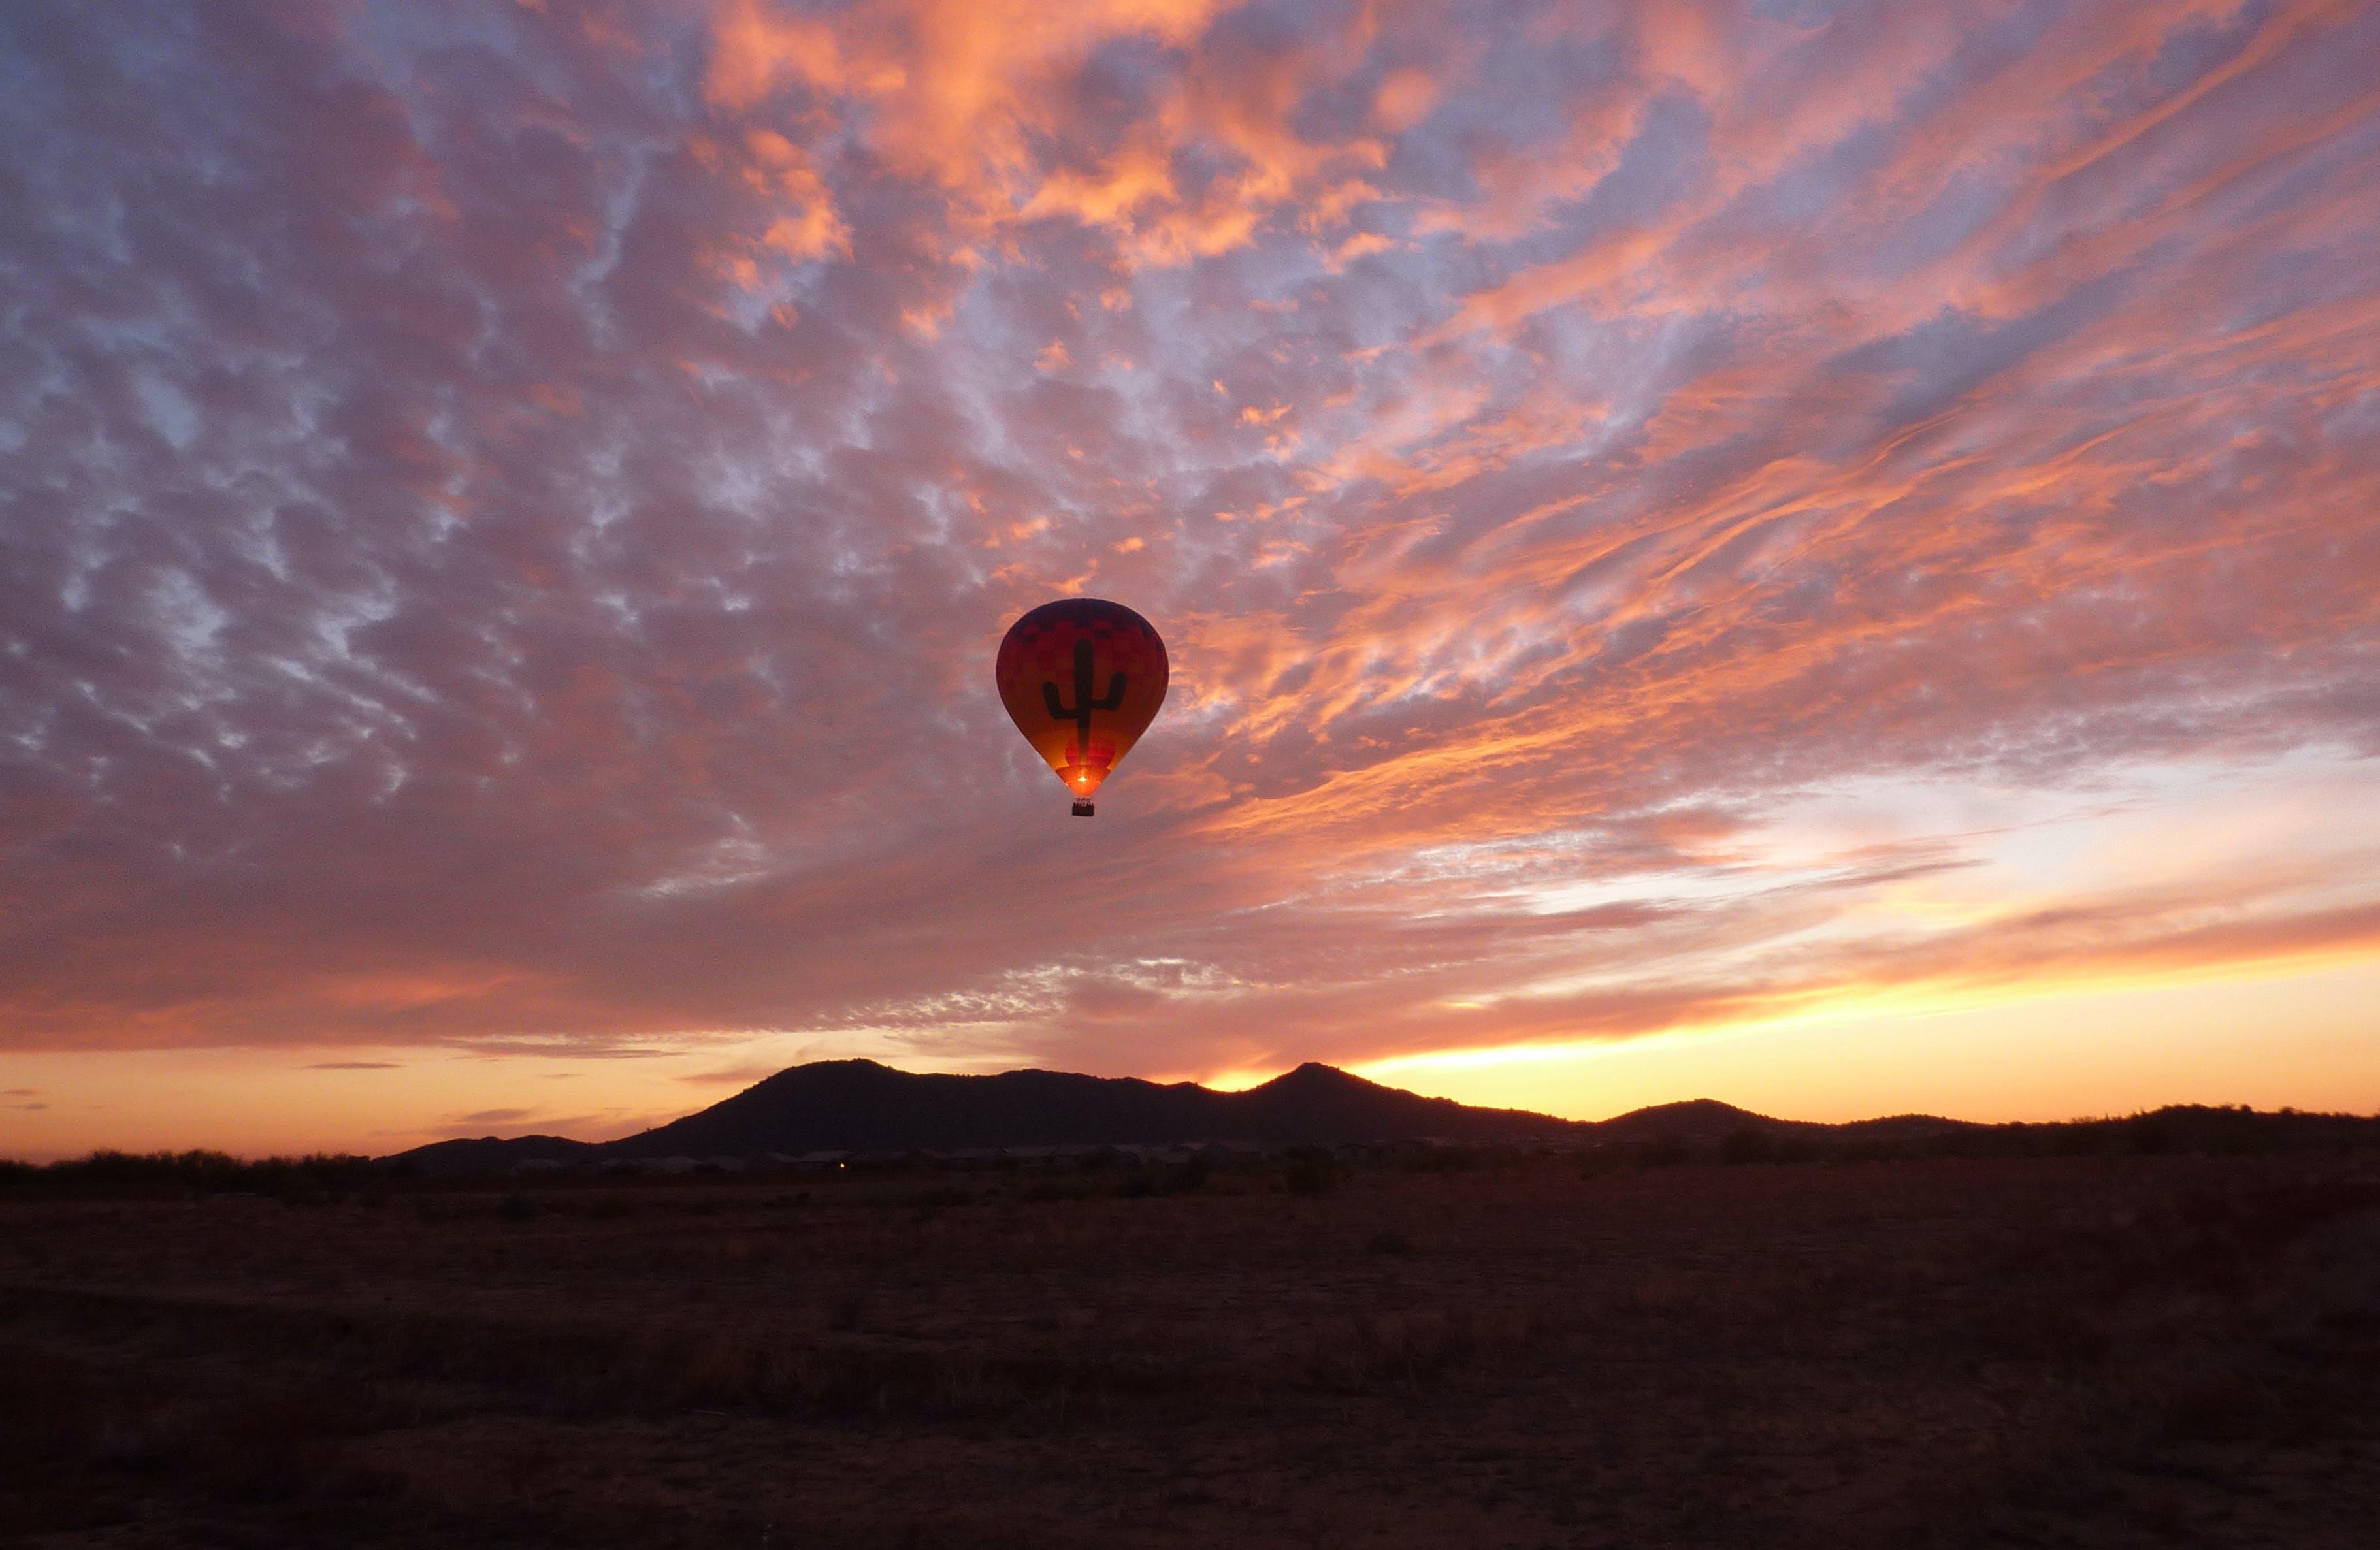 scottsdale in arizona